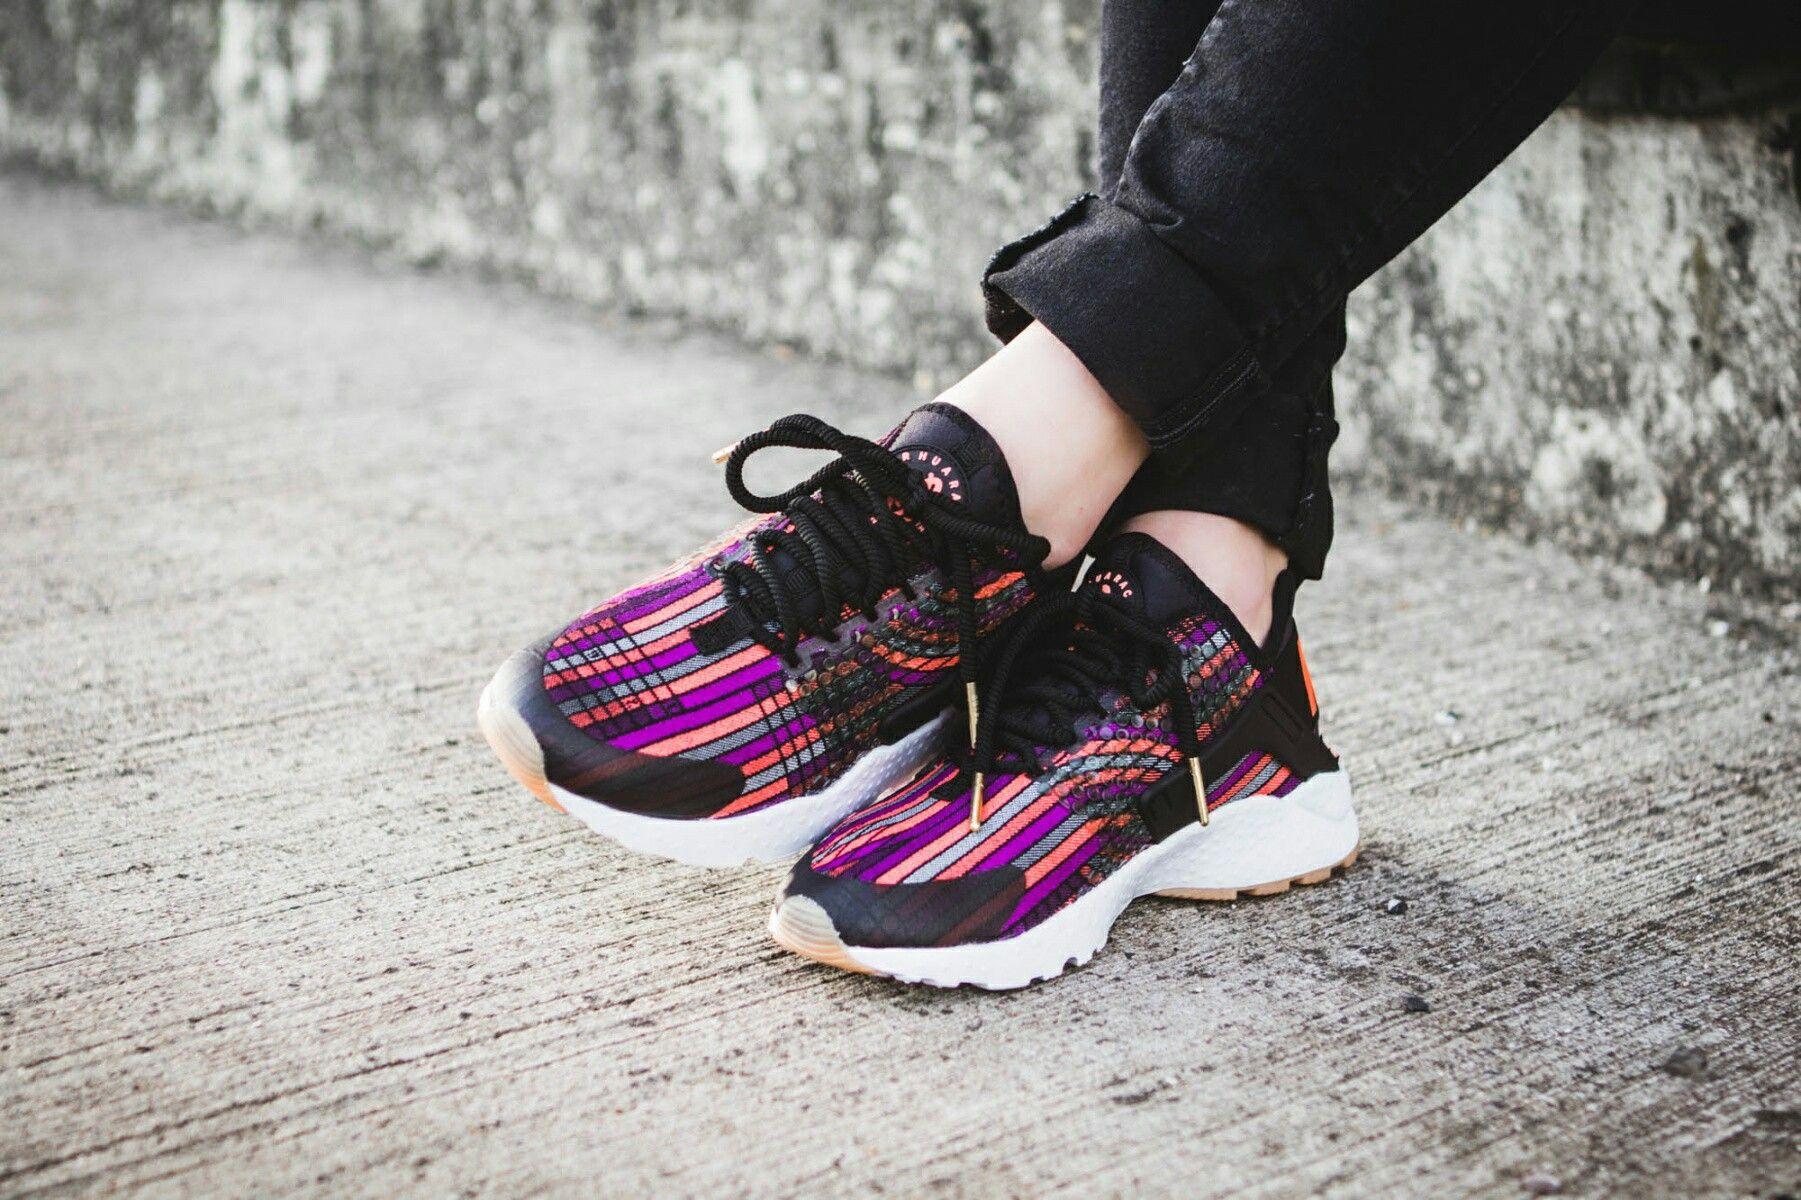 Nike Huarache rn ultra jcd pr #Nike#Huarache#Run#Ultra#Jacquard ...